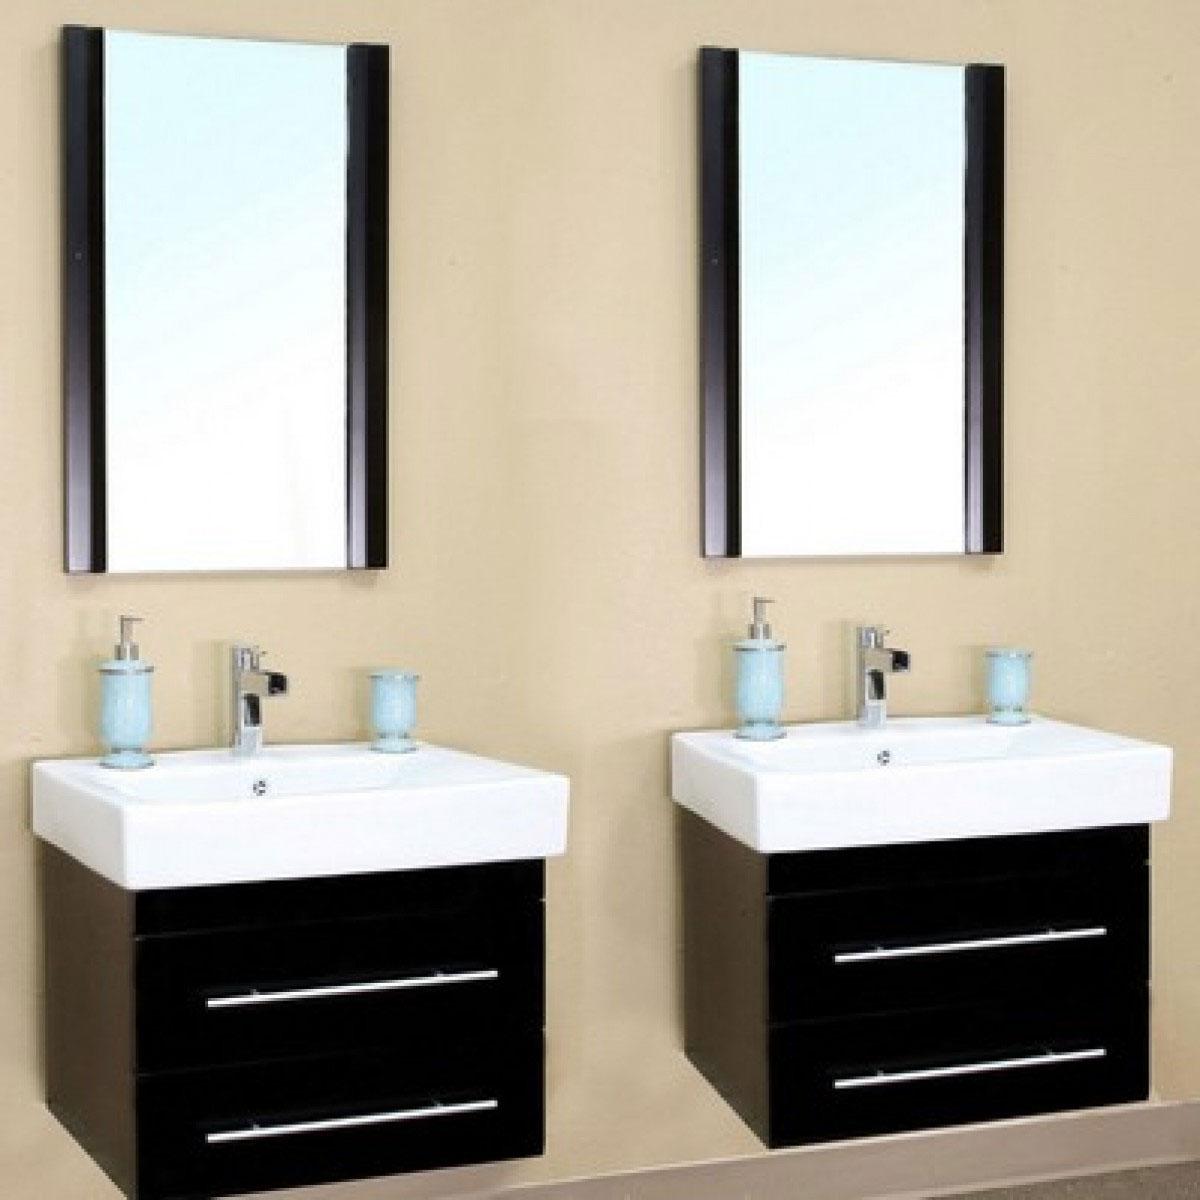 Wall Bathroom Vanity: Double Wall-Mount Sink Vanity In Bathroom Vanities